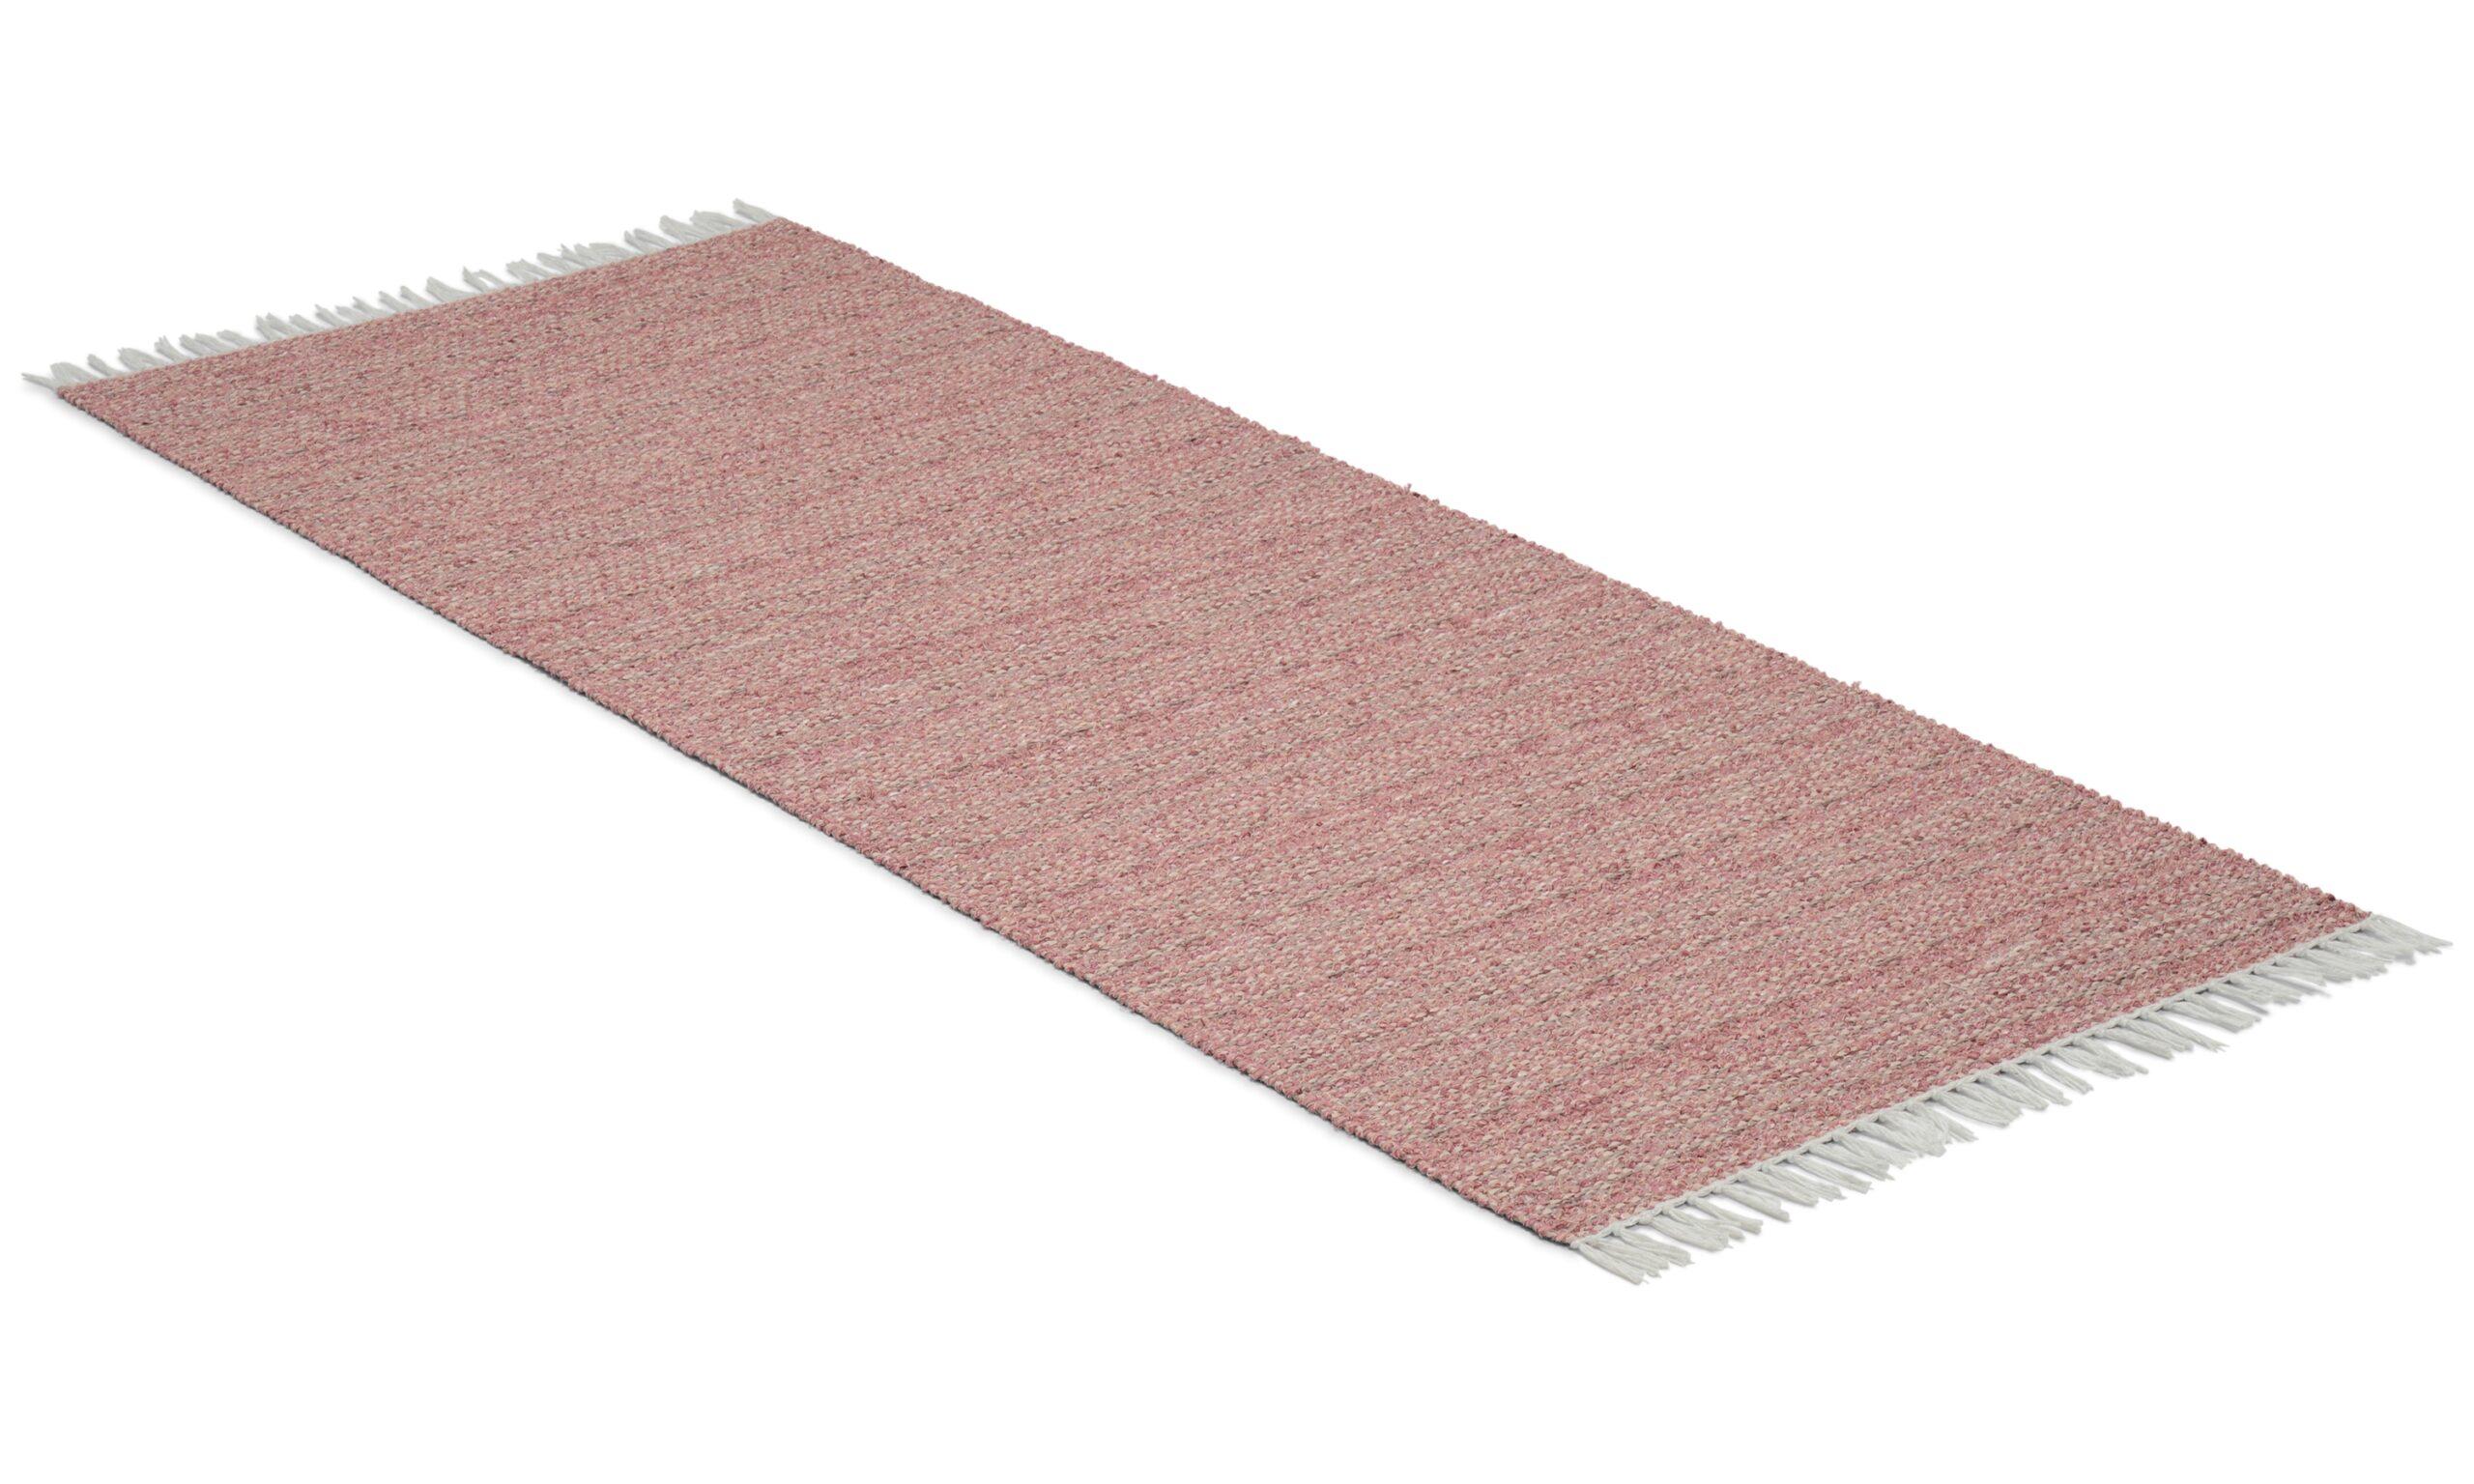 Svea mix rosa - plast- og garnteppe